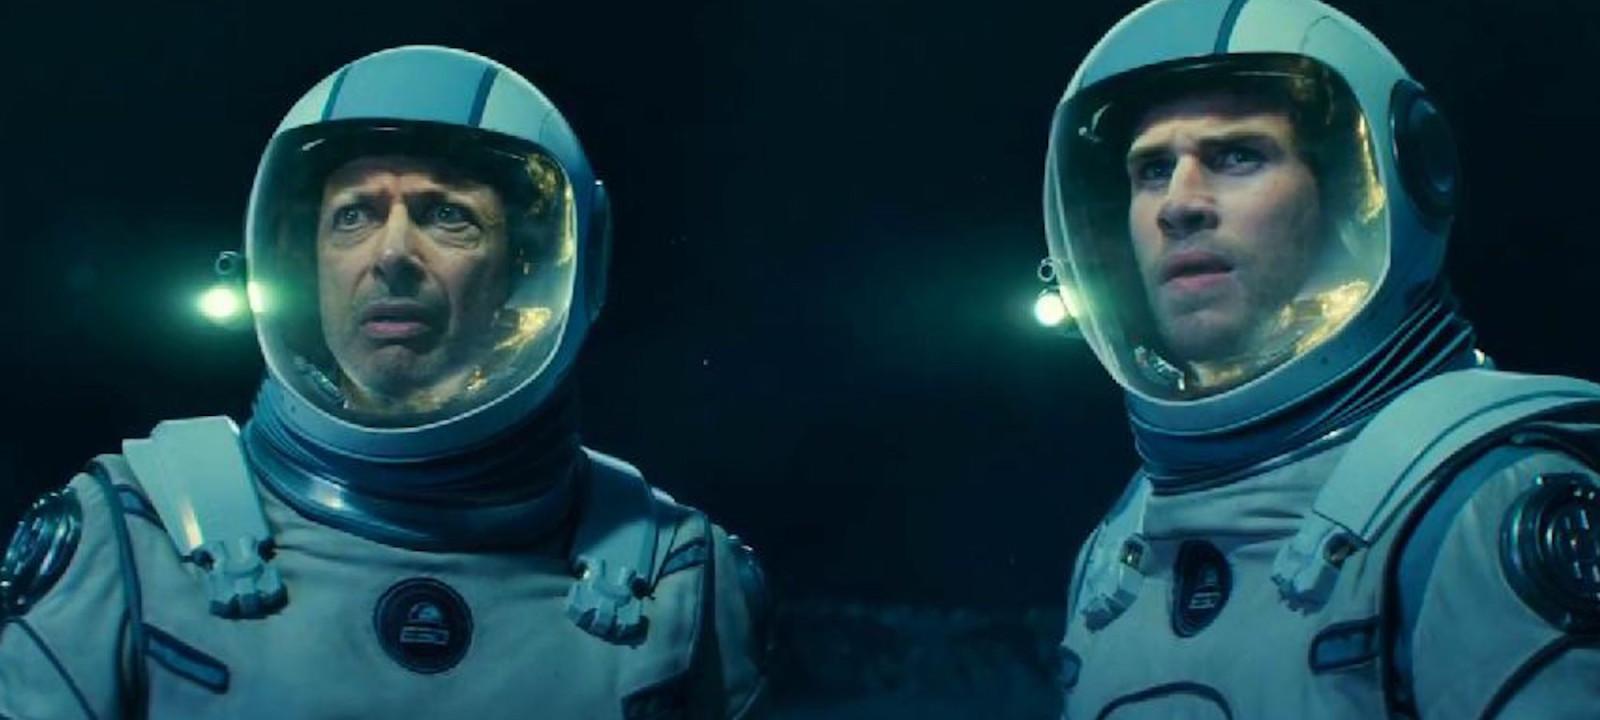 Jeff Goldblum and Liam Hemsworth in 'Independence Day: Resurgence'